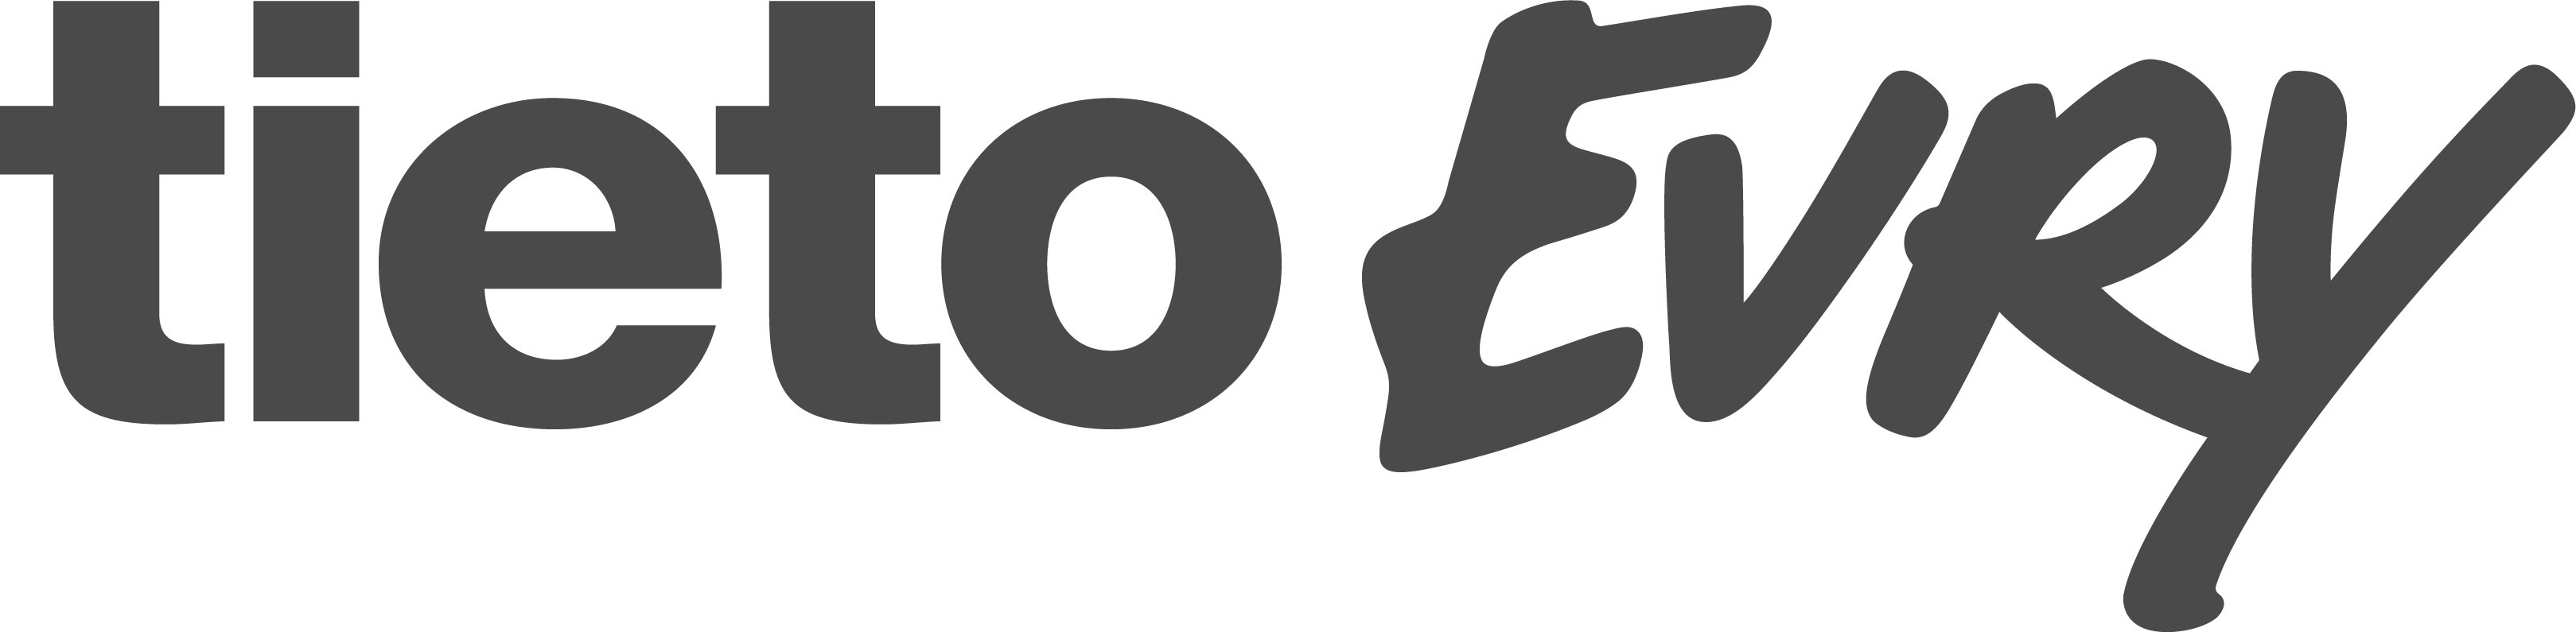 TietoEVRY Corporation